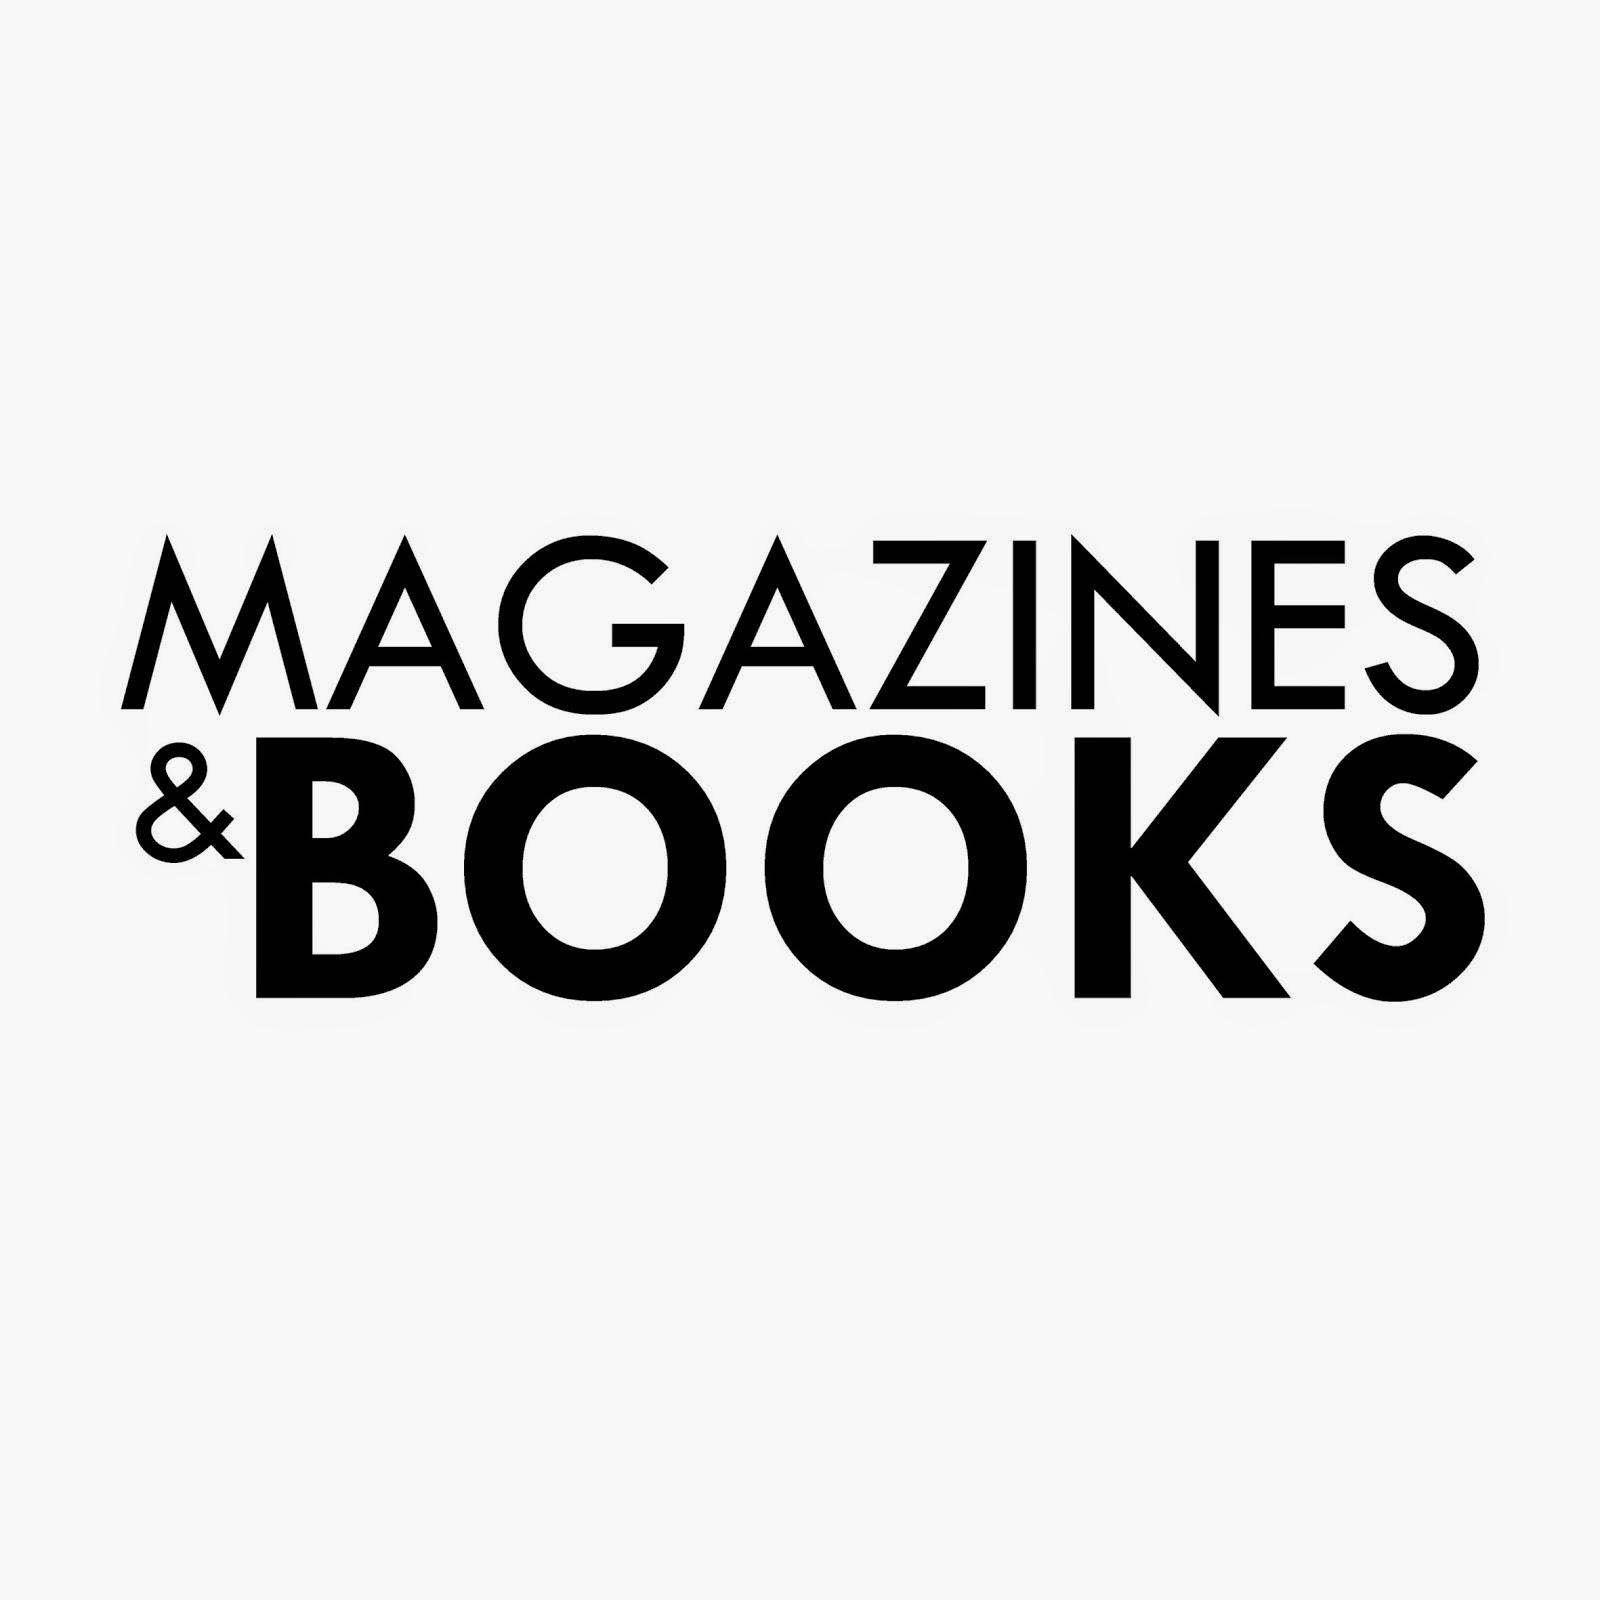 MAGAZINES & BOOKS_